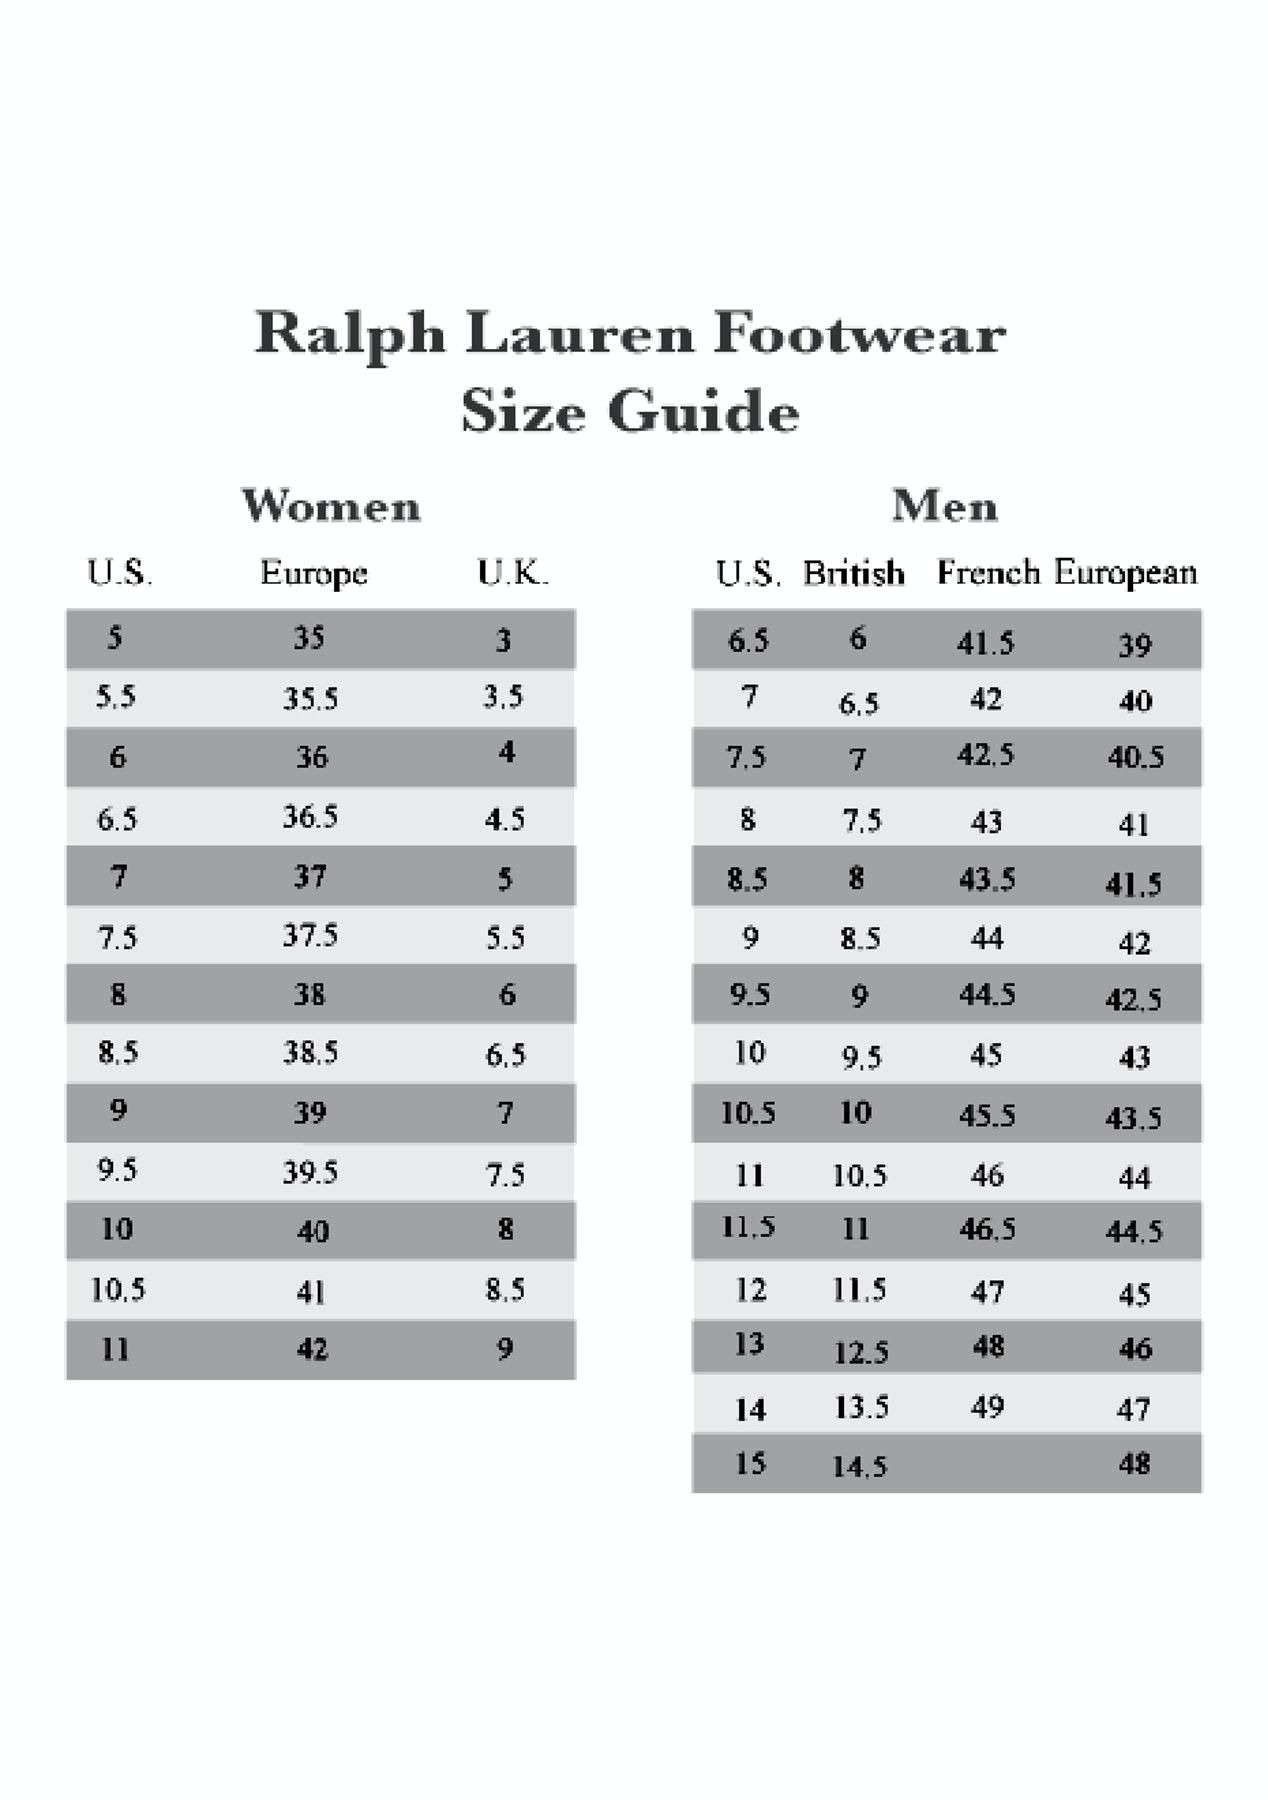 Polo Ralph Lauren - Summit Scuff - Tan